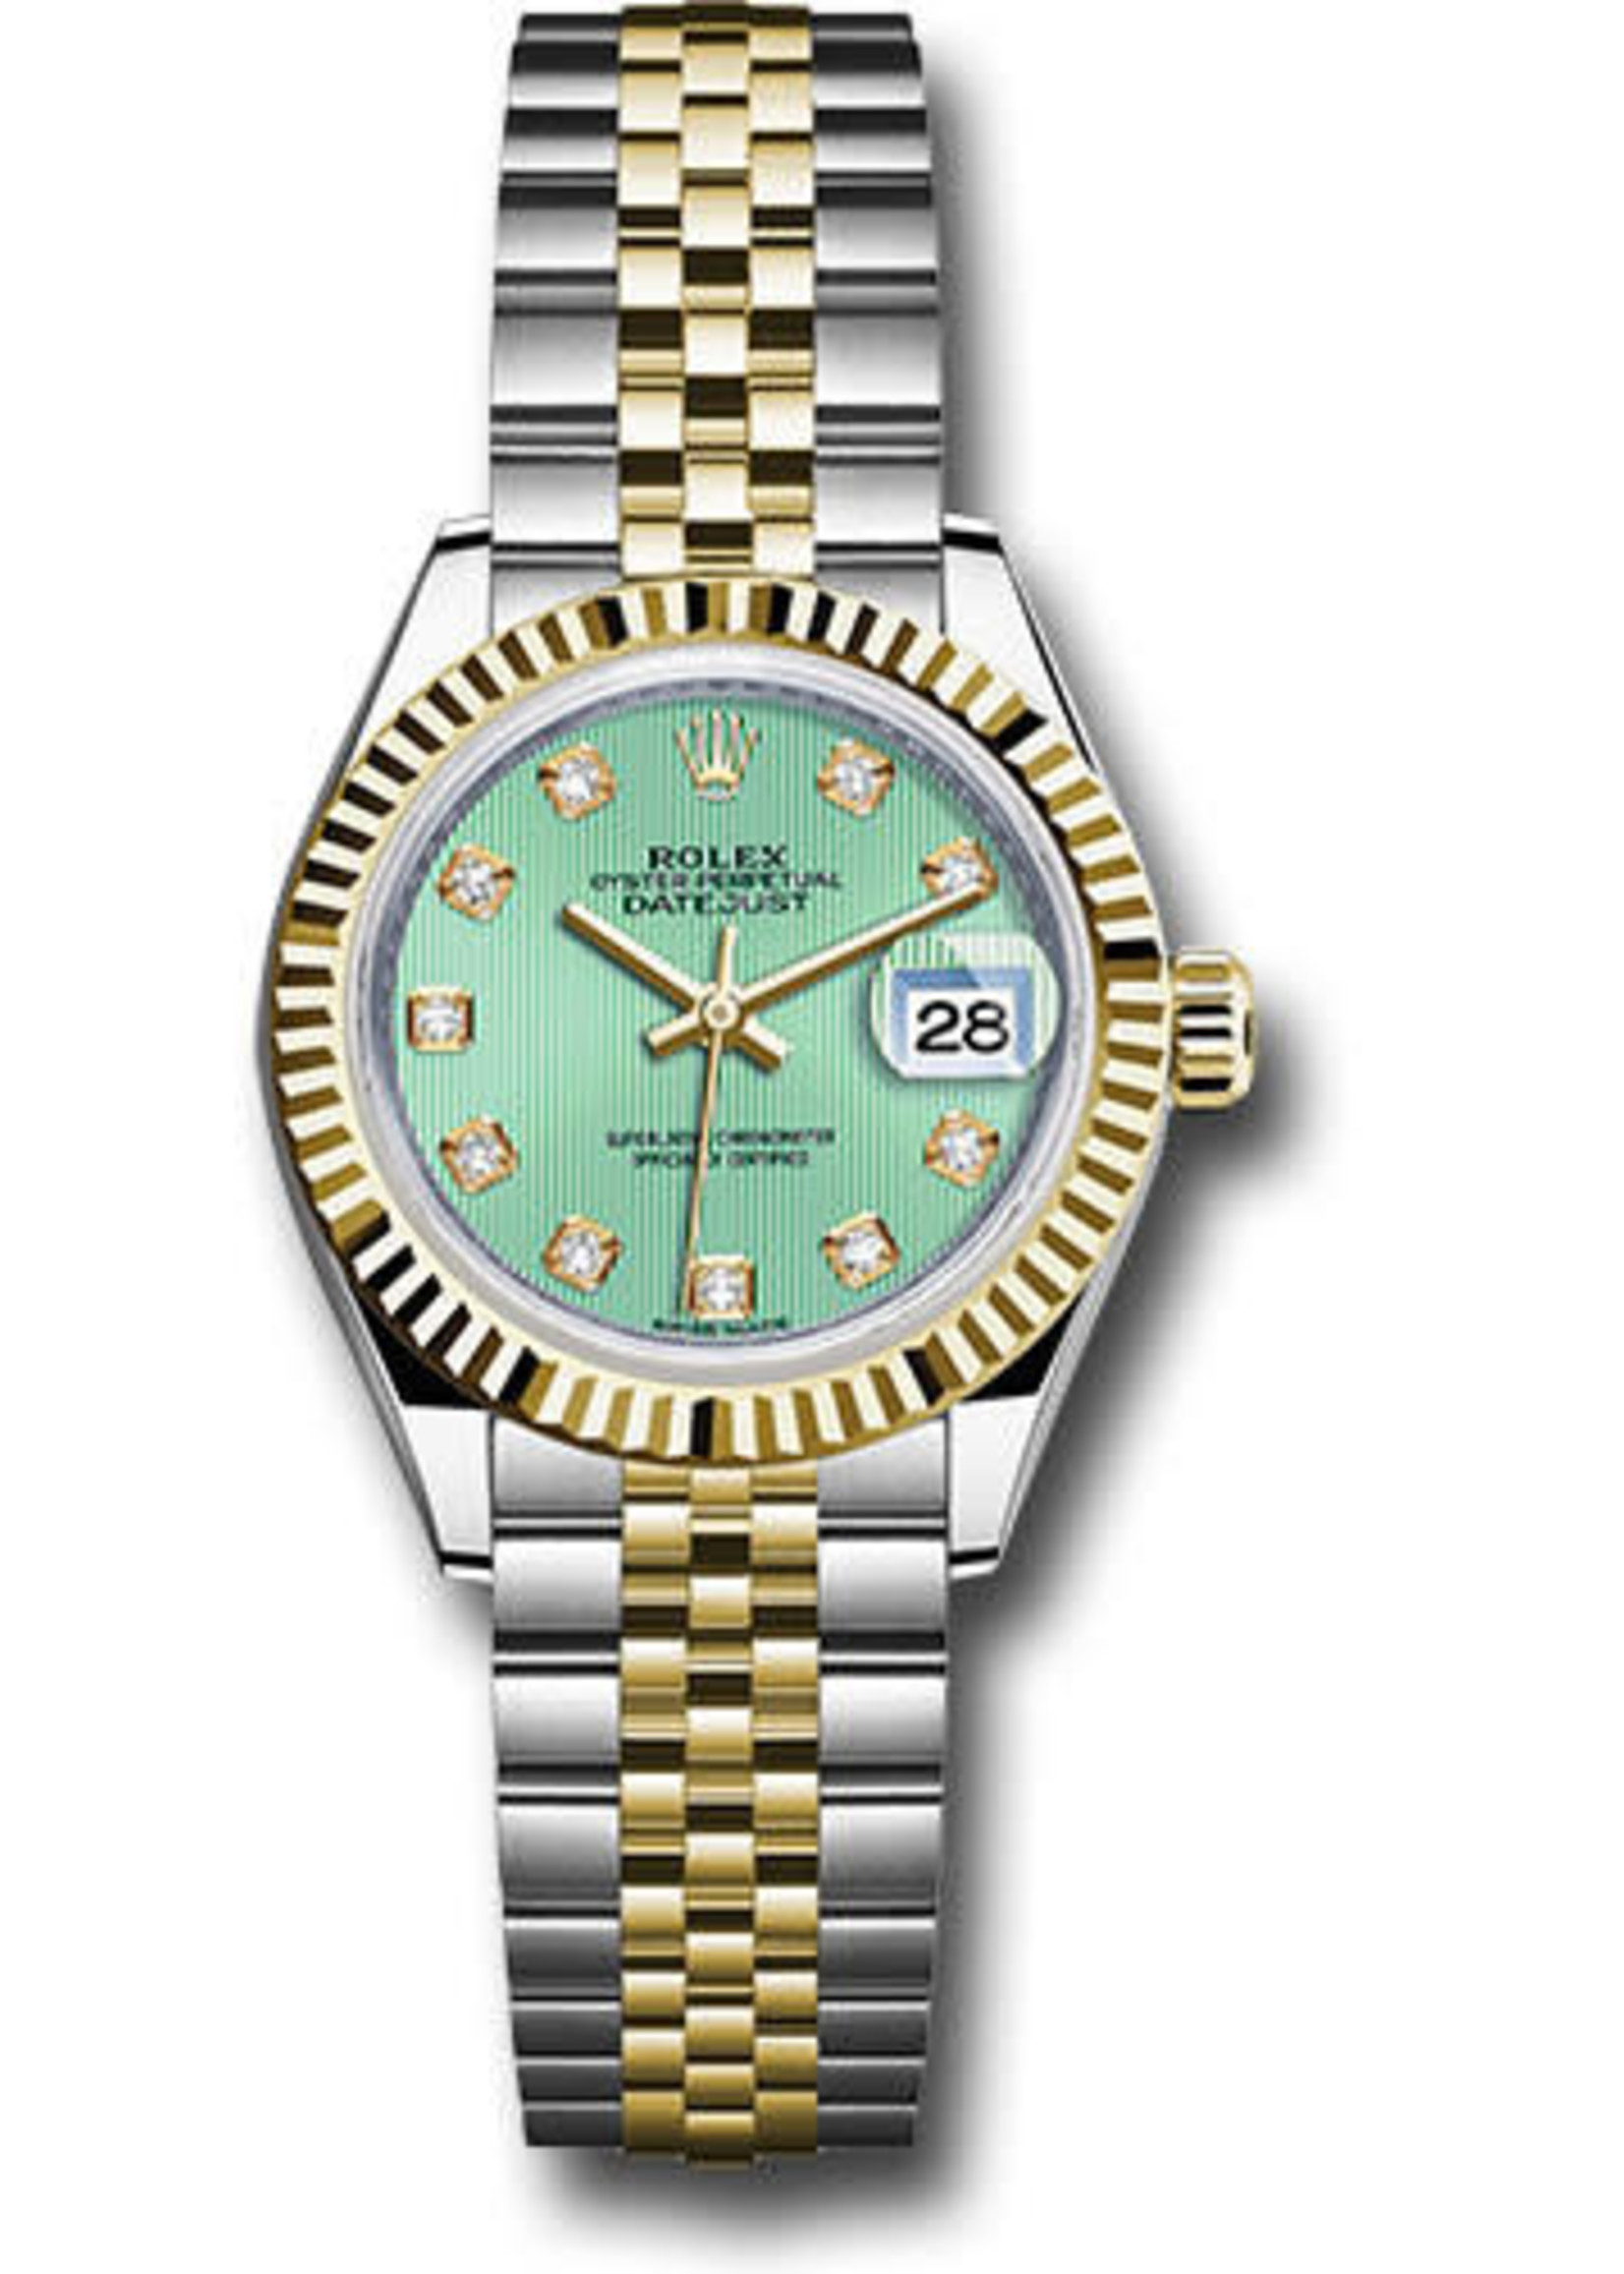 Rolex ROLEX DATEJUST 28MM #279173 (2017 B+P)